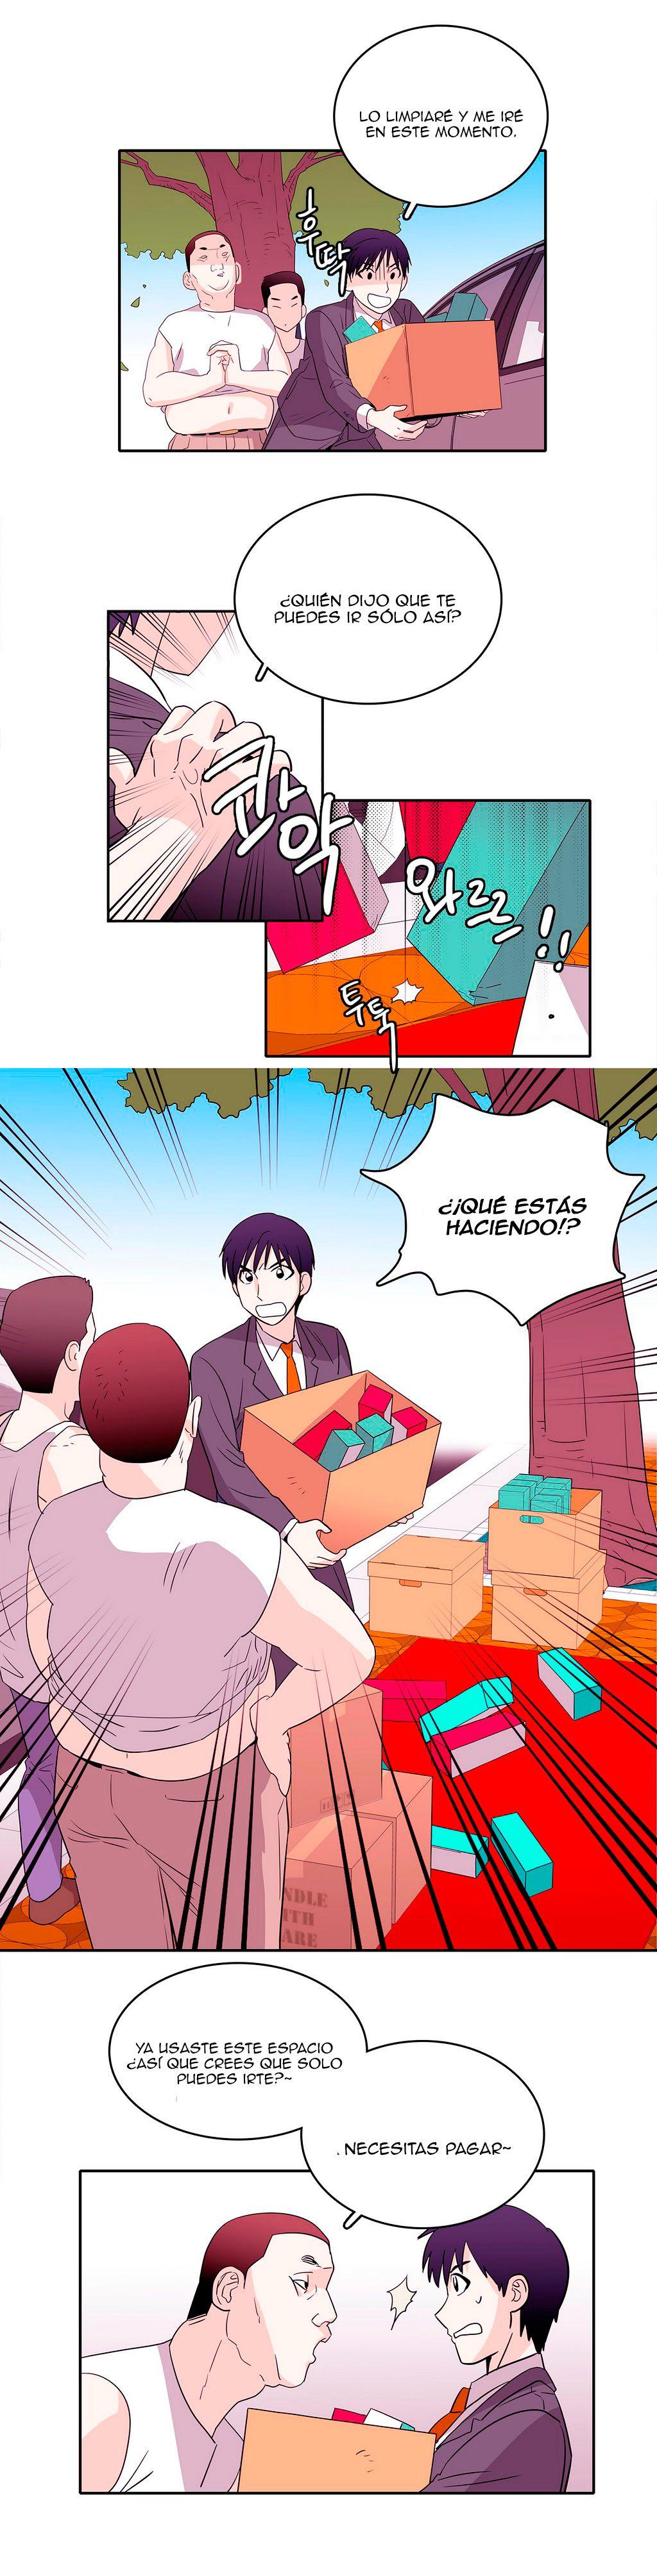 http://c5.ninemanga.com/es_manga/51/19443/463659/e44a045fd42b7e450f0554f33df0b073.jpg Page 3